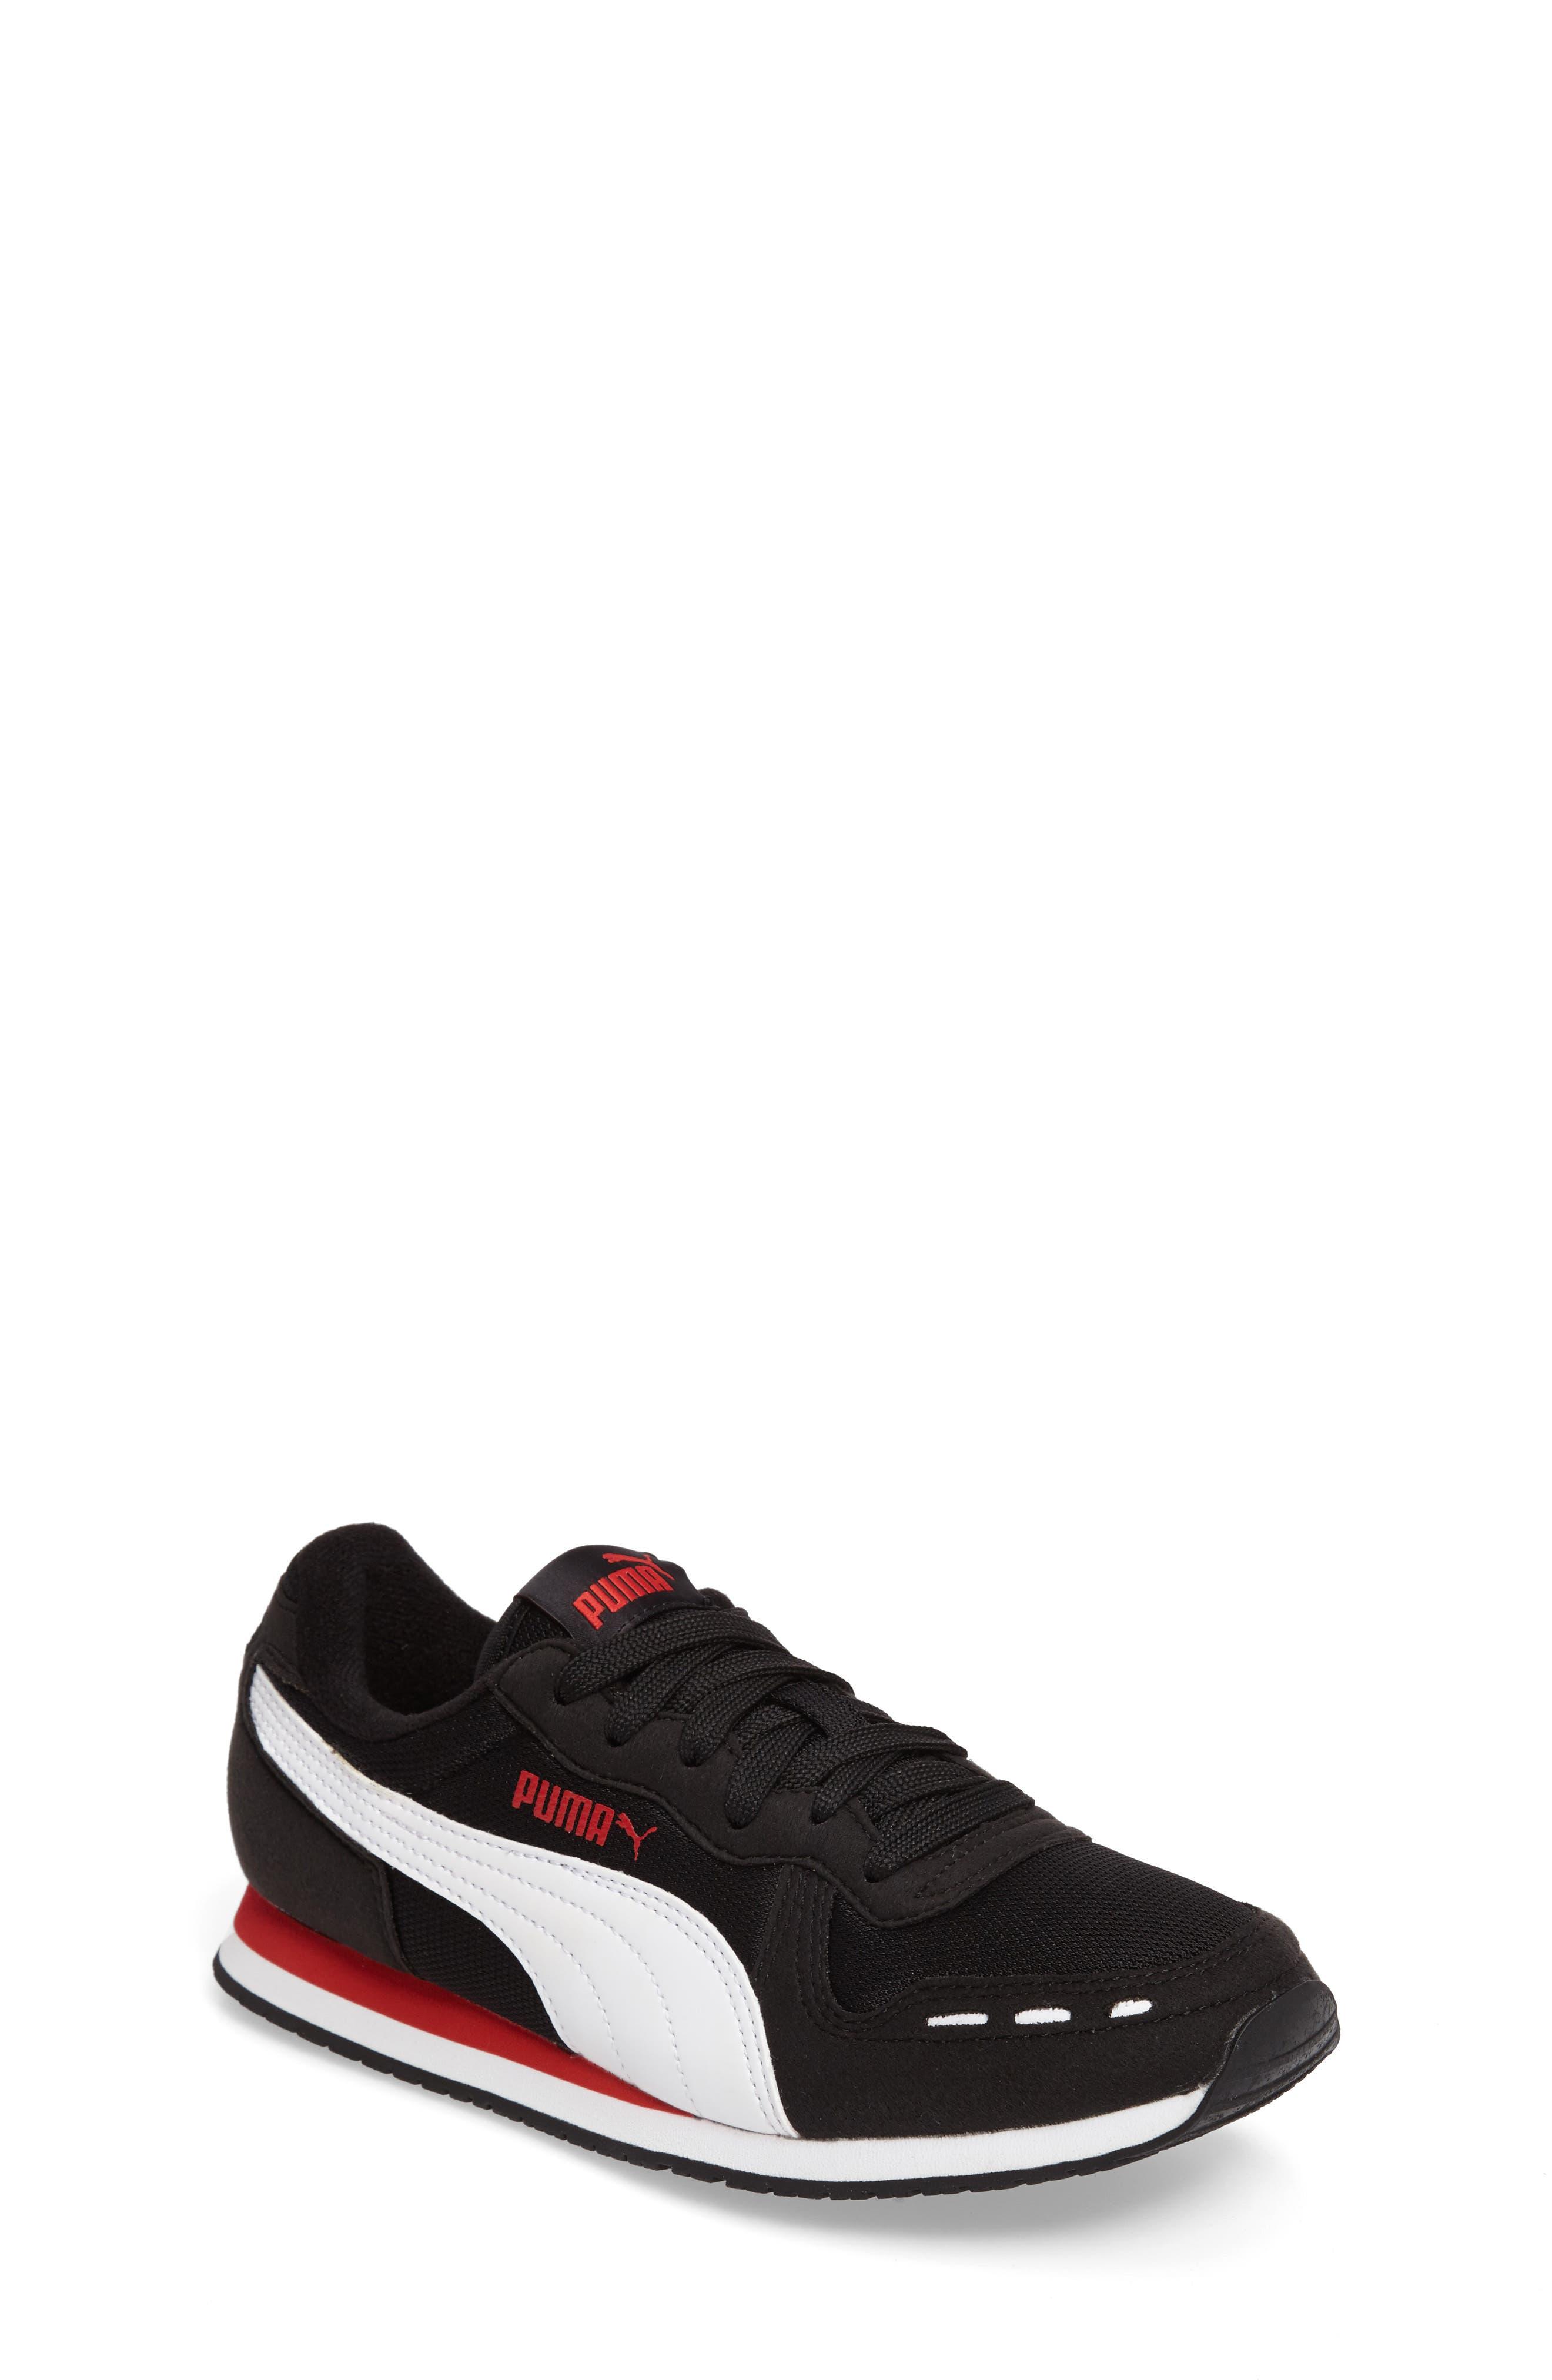 Cabana Racer Sneaker,                         Main,                         color, 001